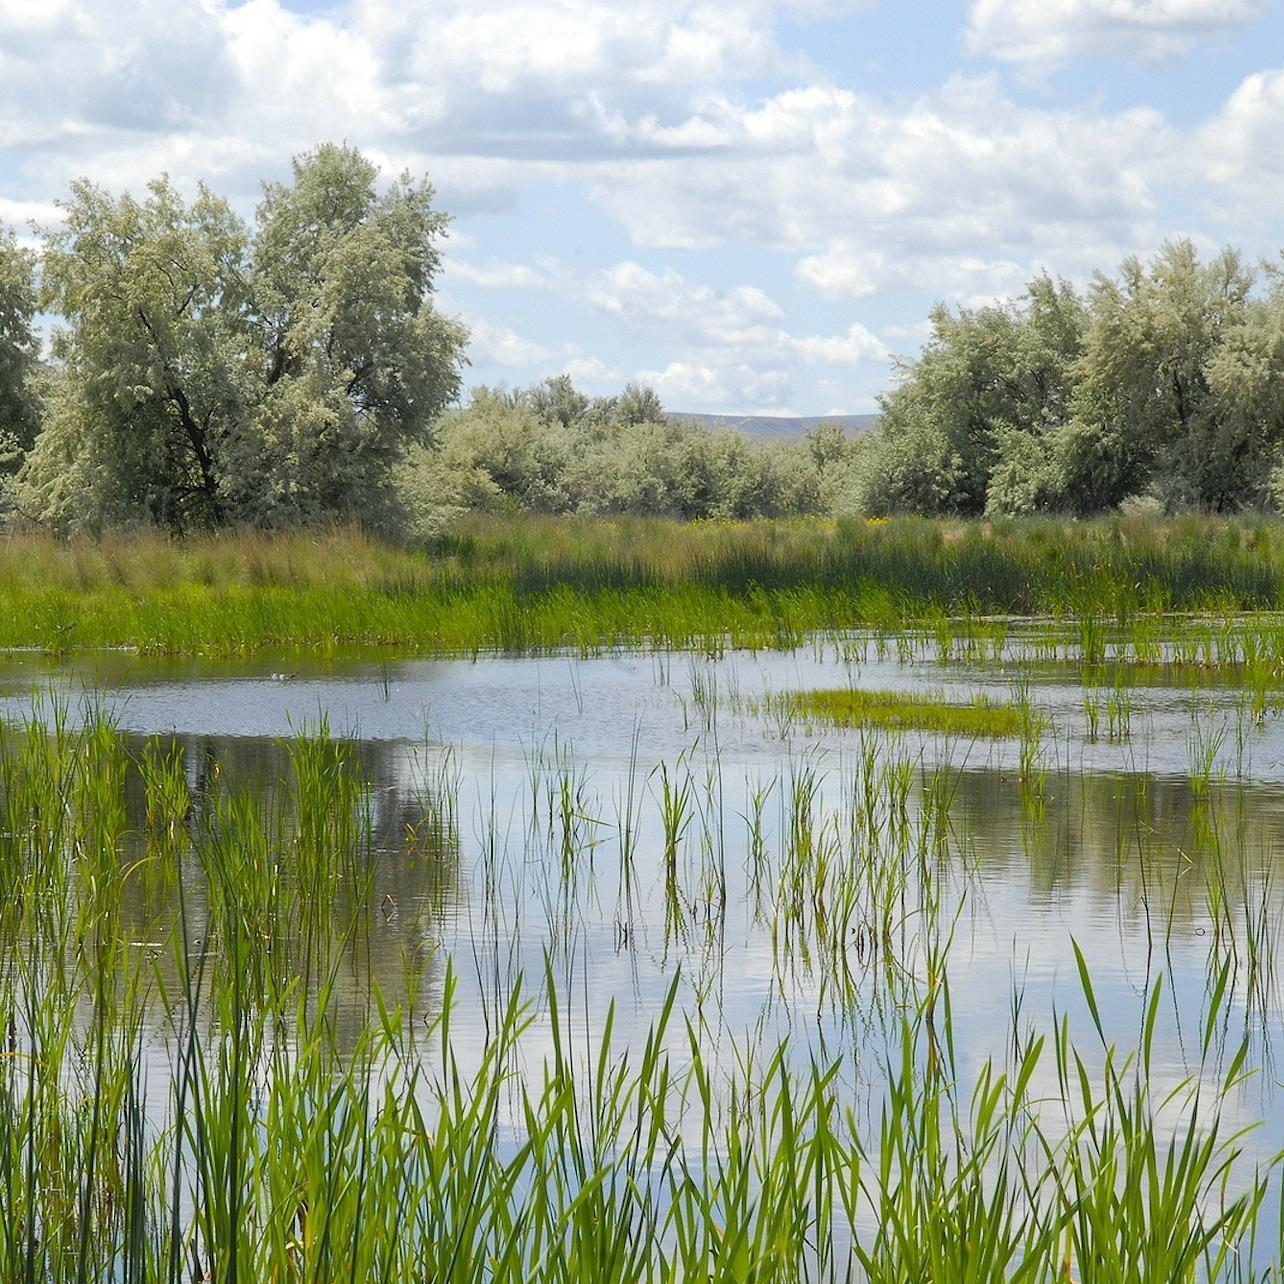 Wetland in Washington State - credit David Mark, Pixabay